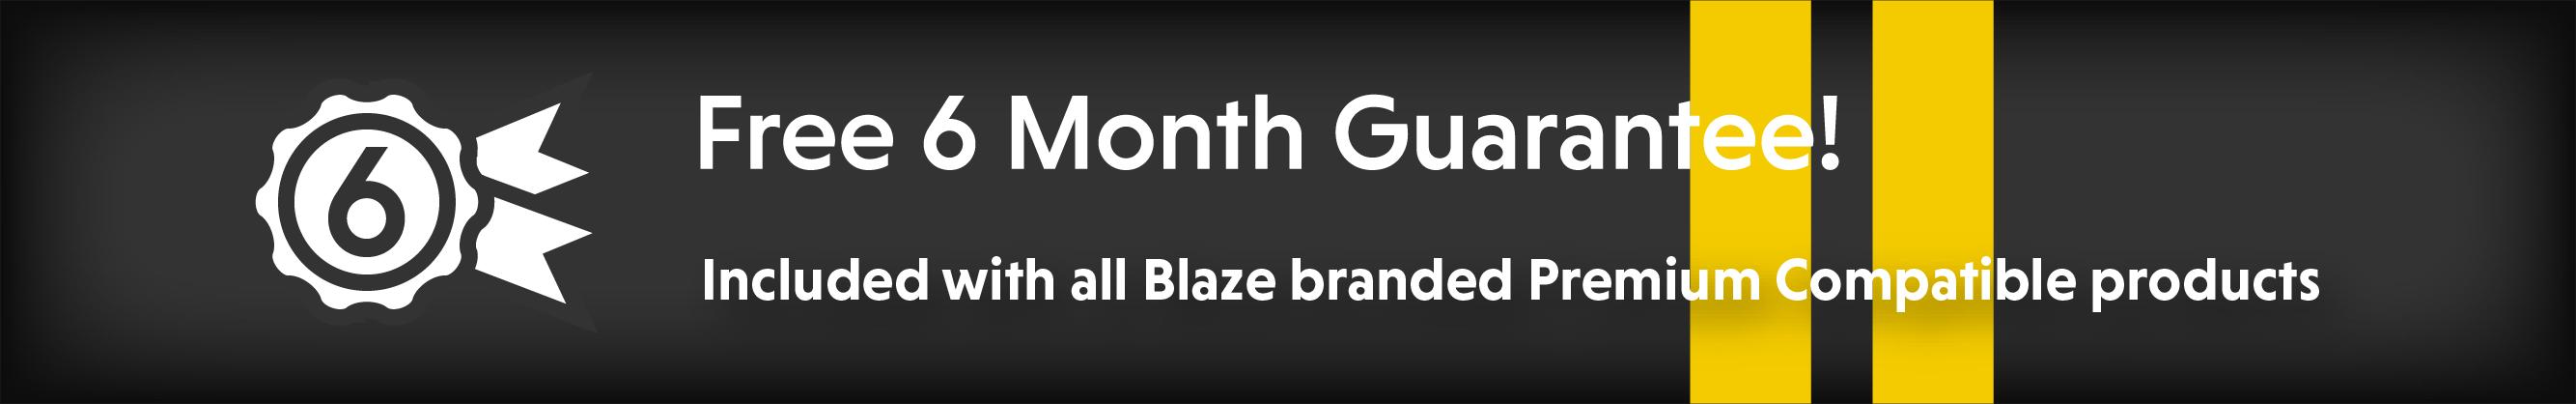 for projectors six month guarantee